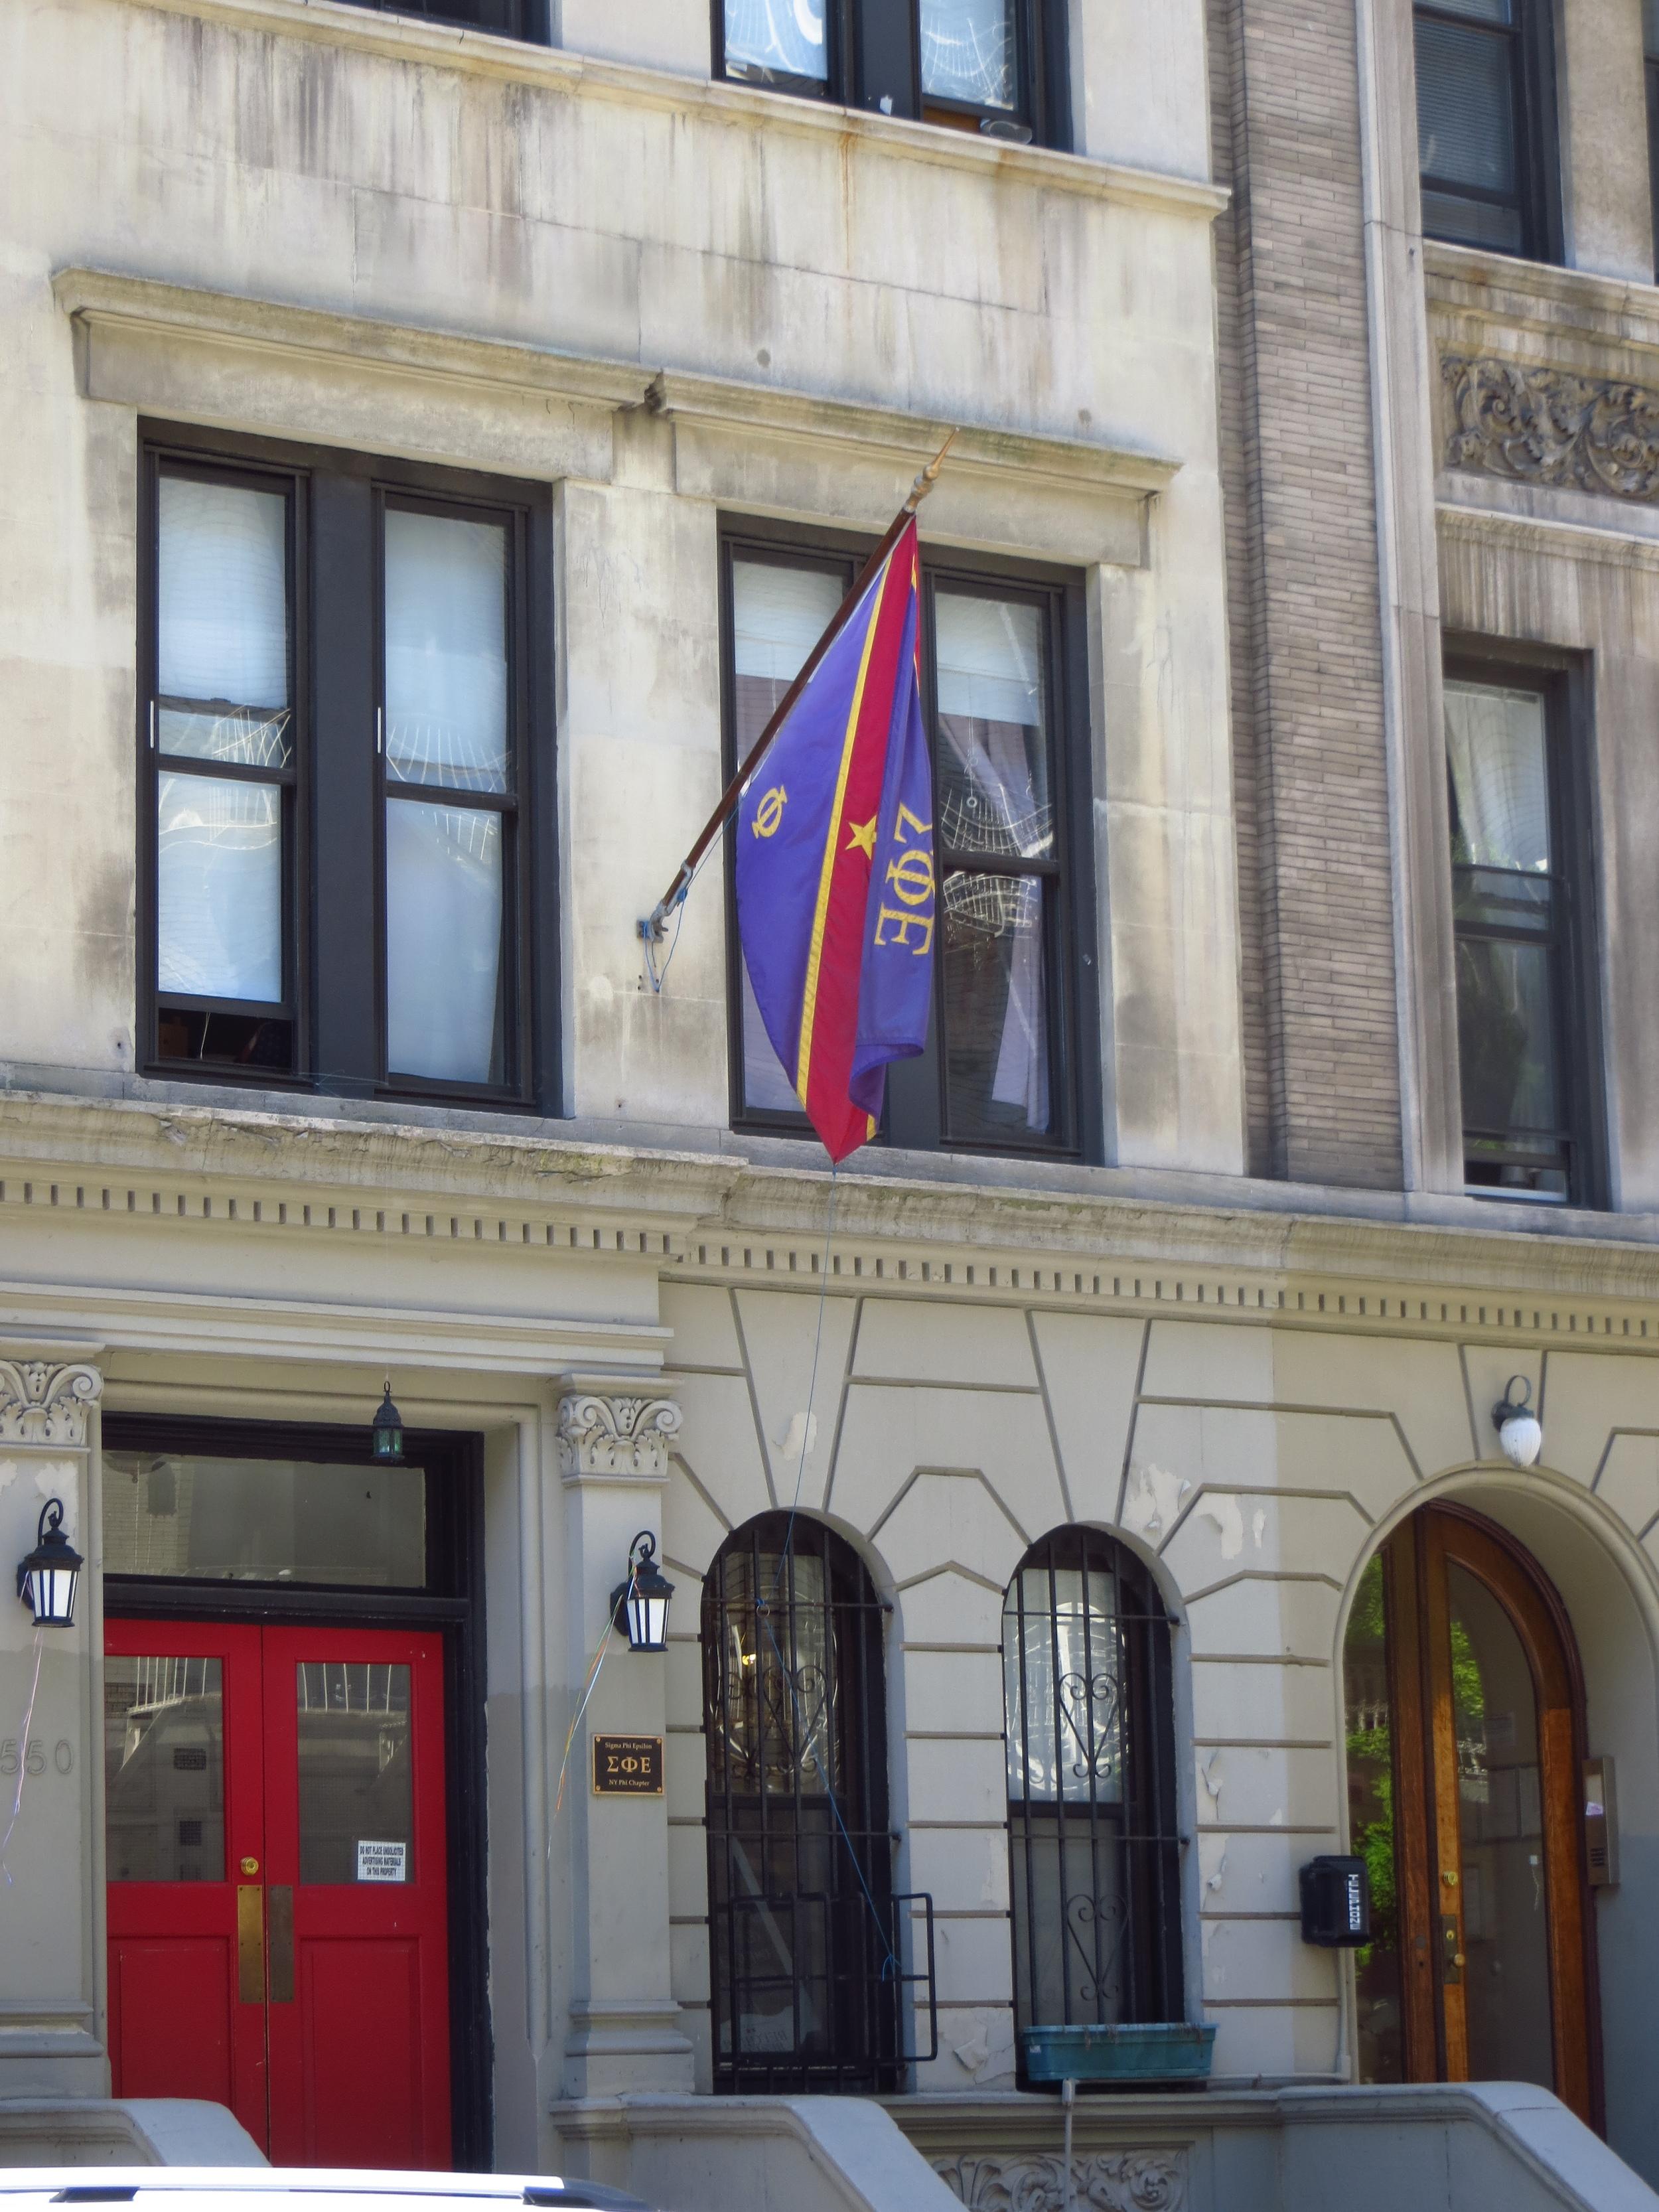 Columbia frat house #1